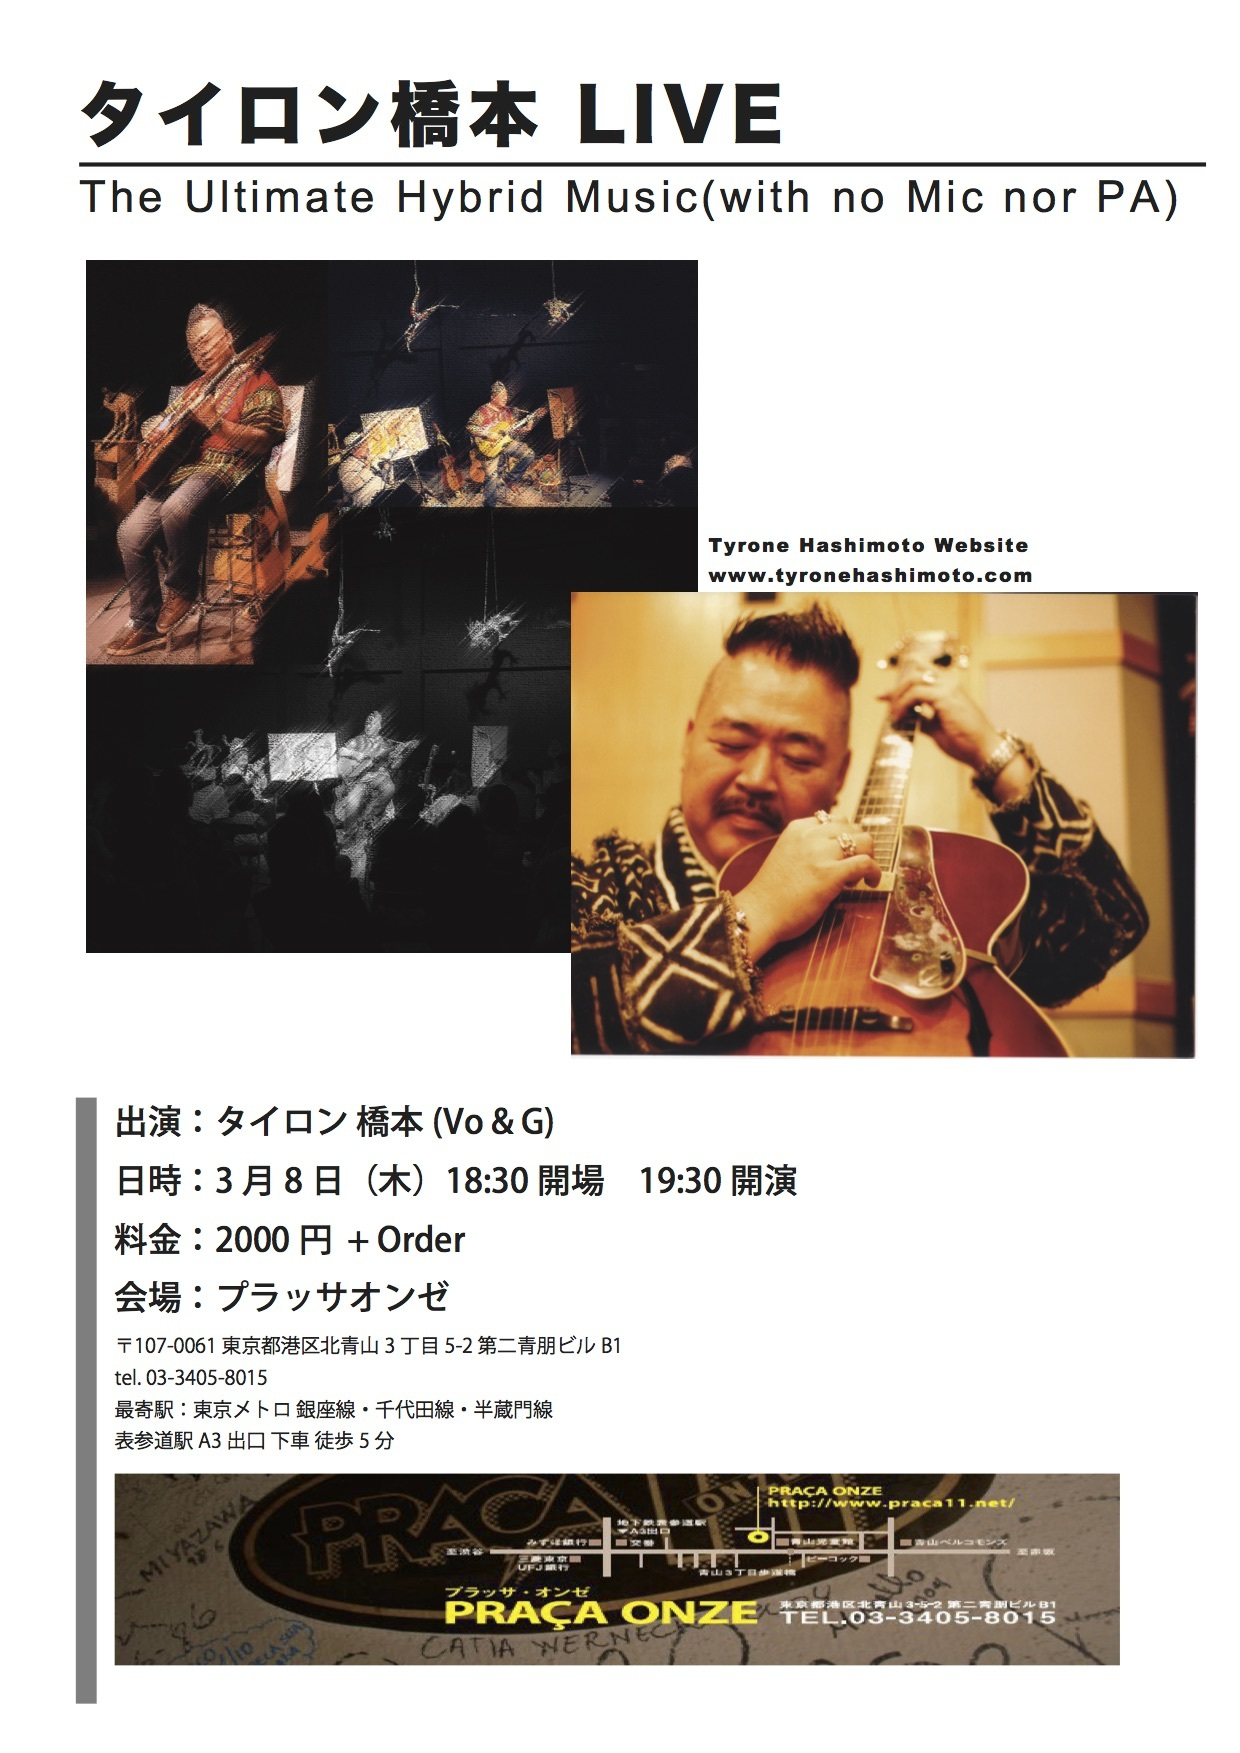 Tyrone Hashimoto 3月 ライブ情報_c0368808_22495929.jpeg